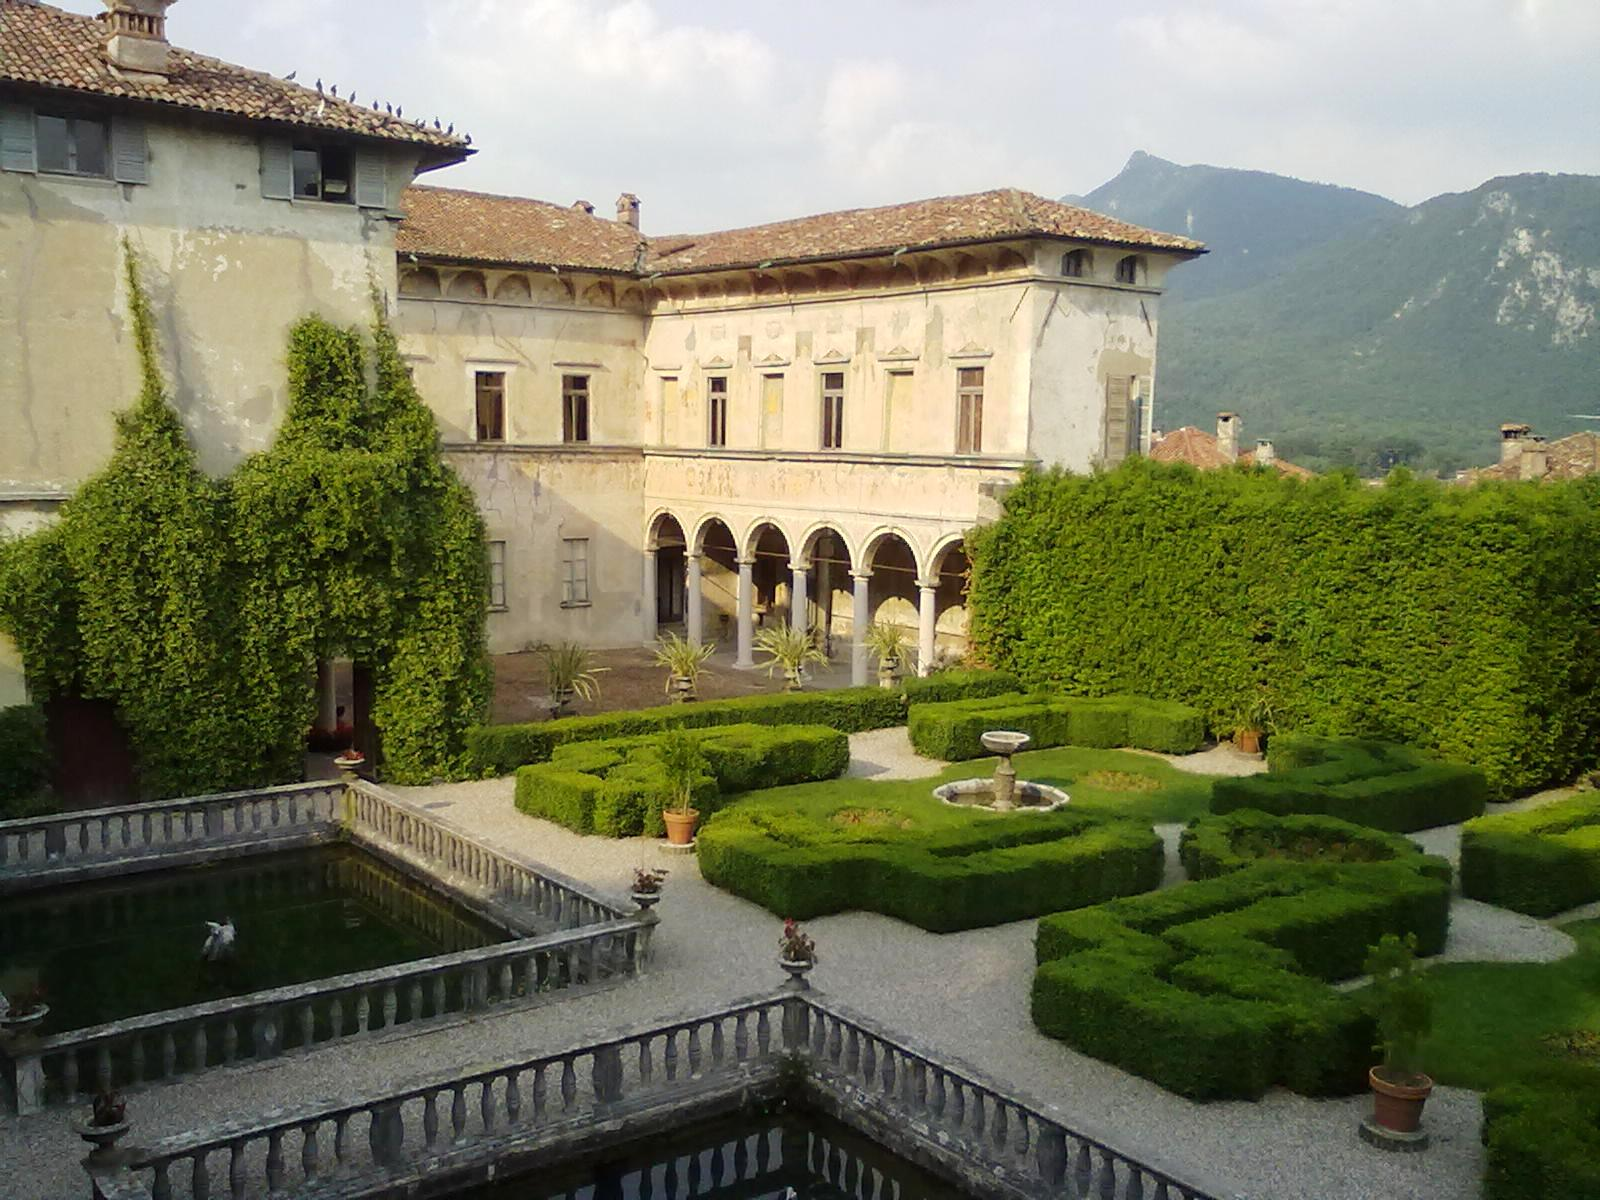 gardentourist-villa-cicogna-mozzoni-01